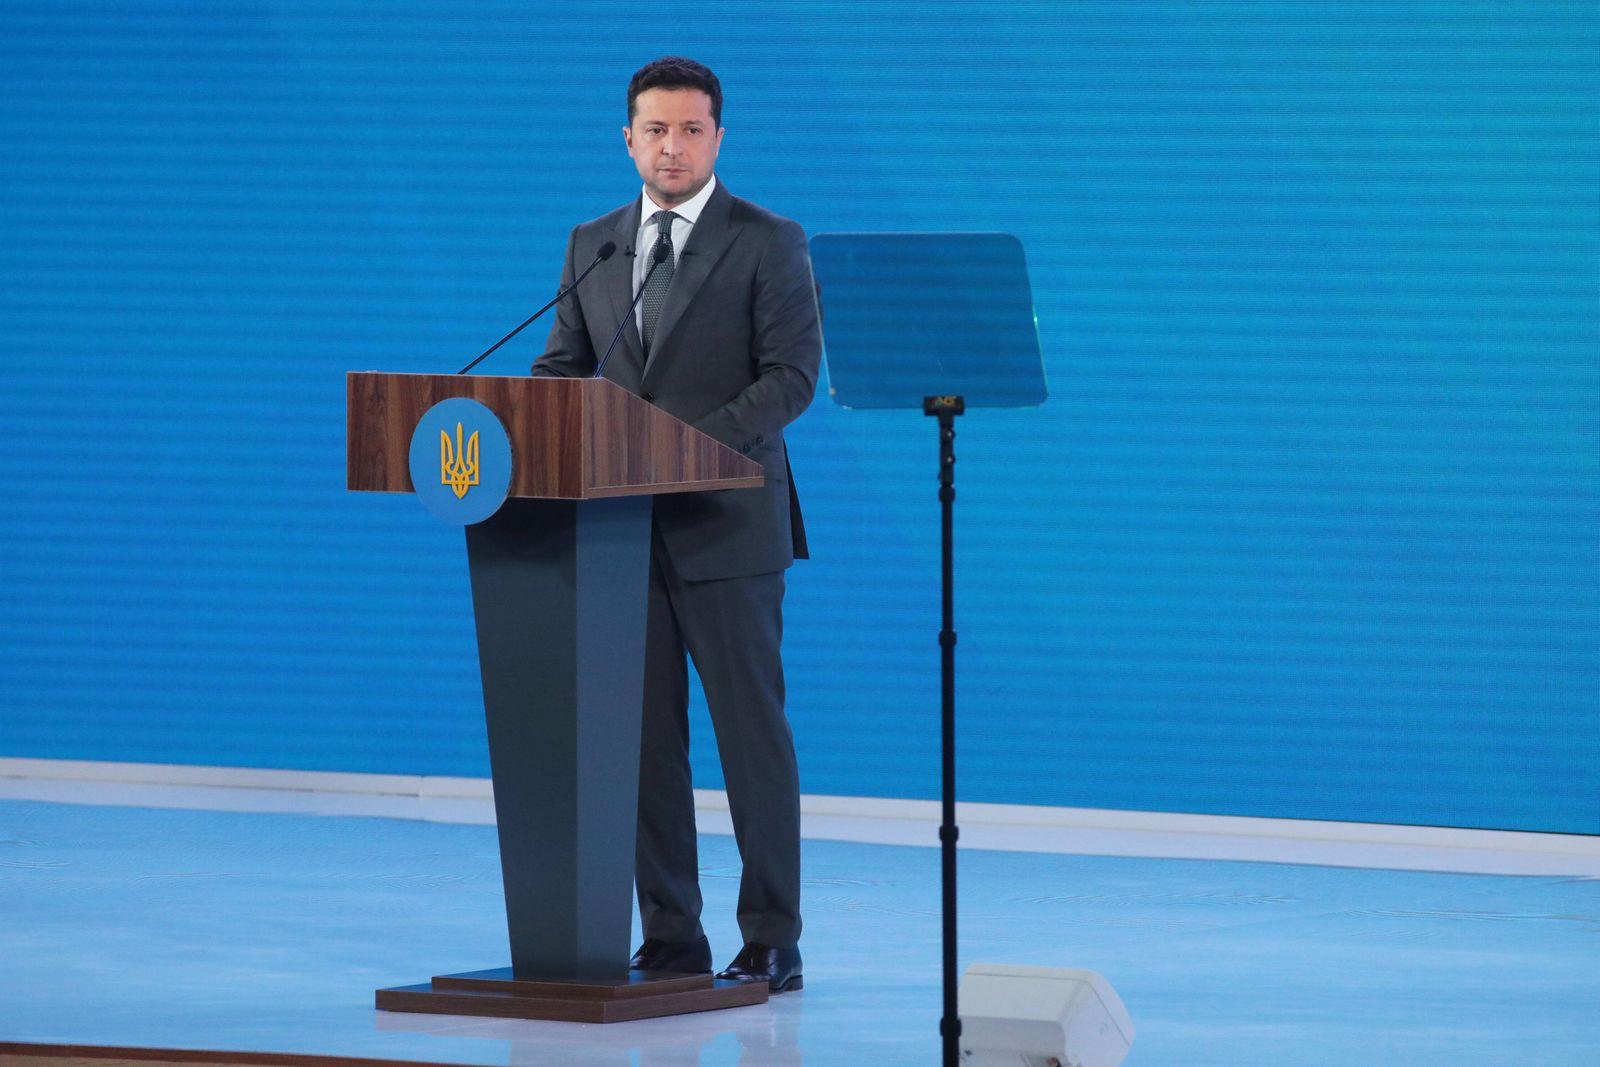 KYIV, UKRAINE - JULY 28, 2021 - President of Ukraine Volodymyr Zelenskyy delivers a speech during the Ukraine 30. Decent